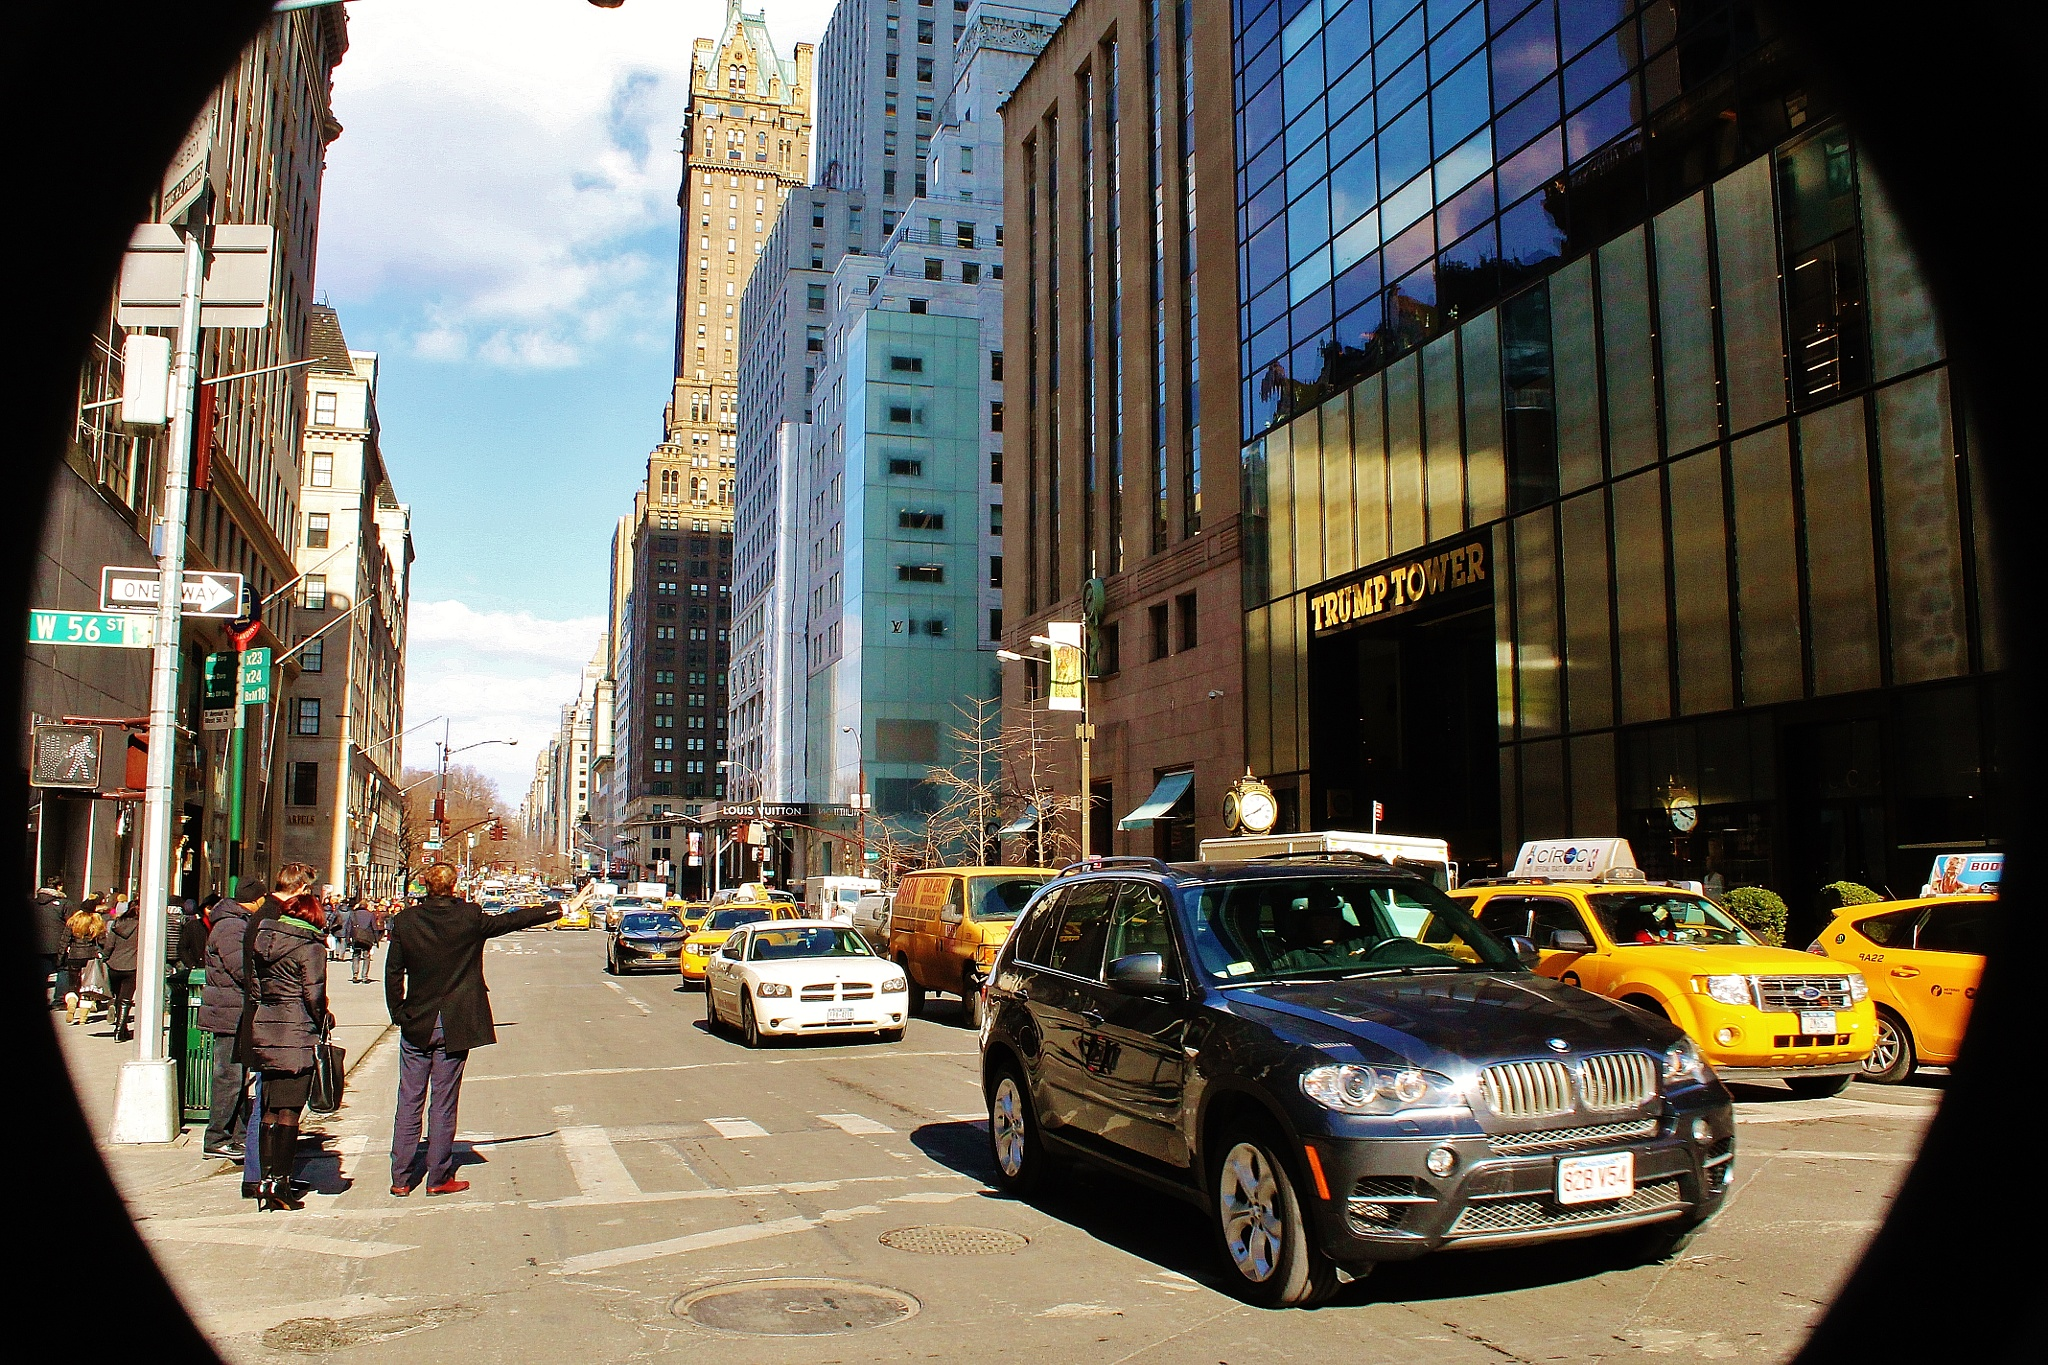 W56 street & 5th Ave by Liborio Drogo